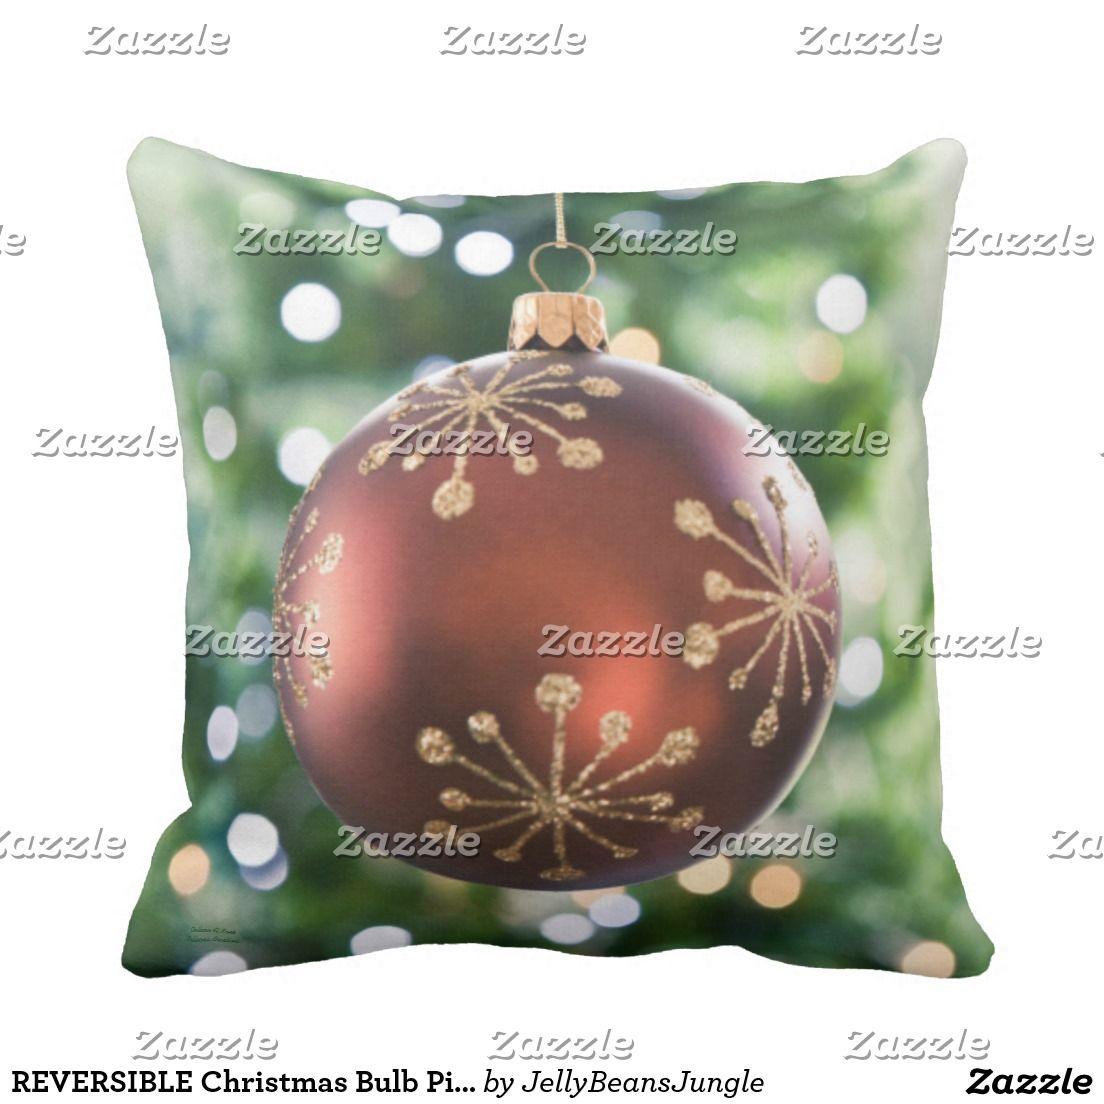 Sentimental Wedding Gift Ideas: REVERSIBLE Christmas Bulb Pillow (green)